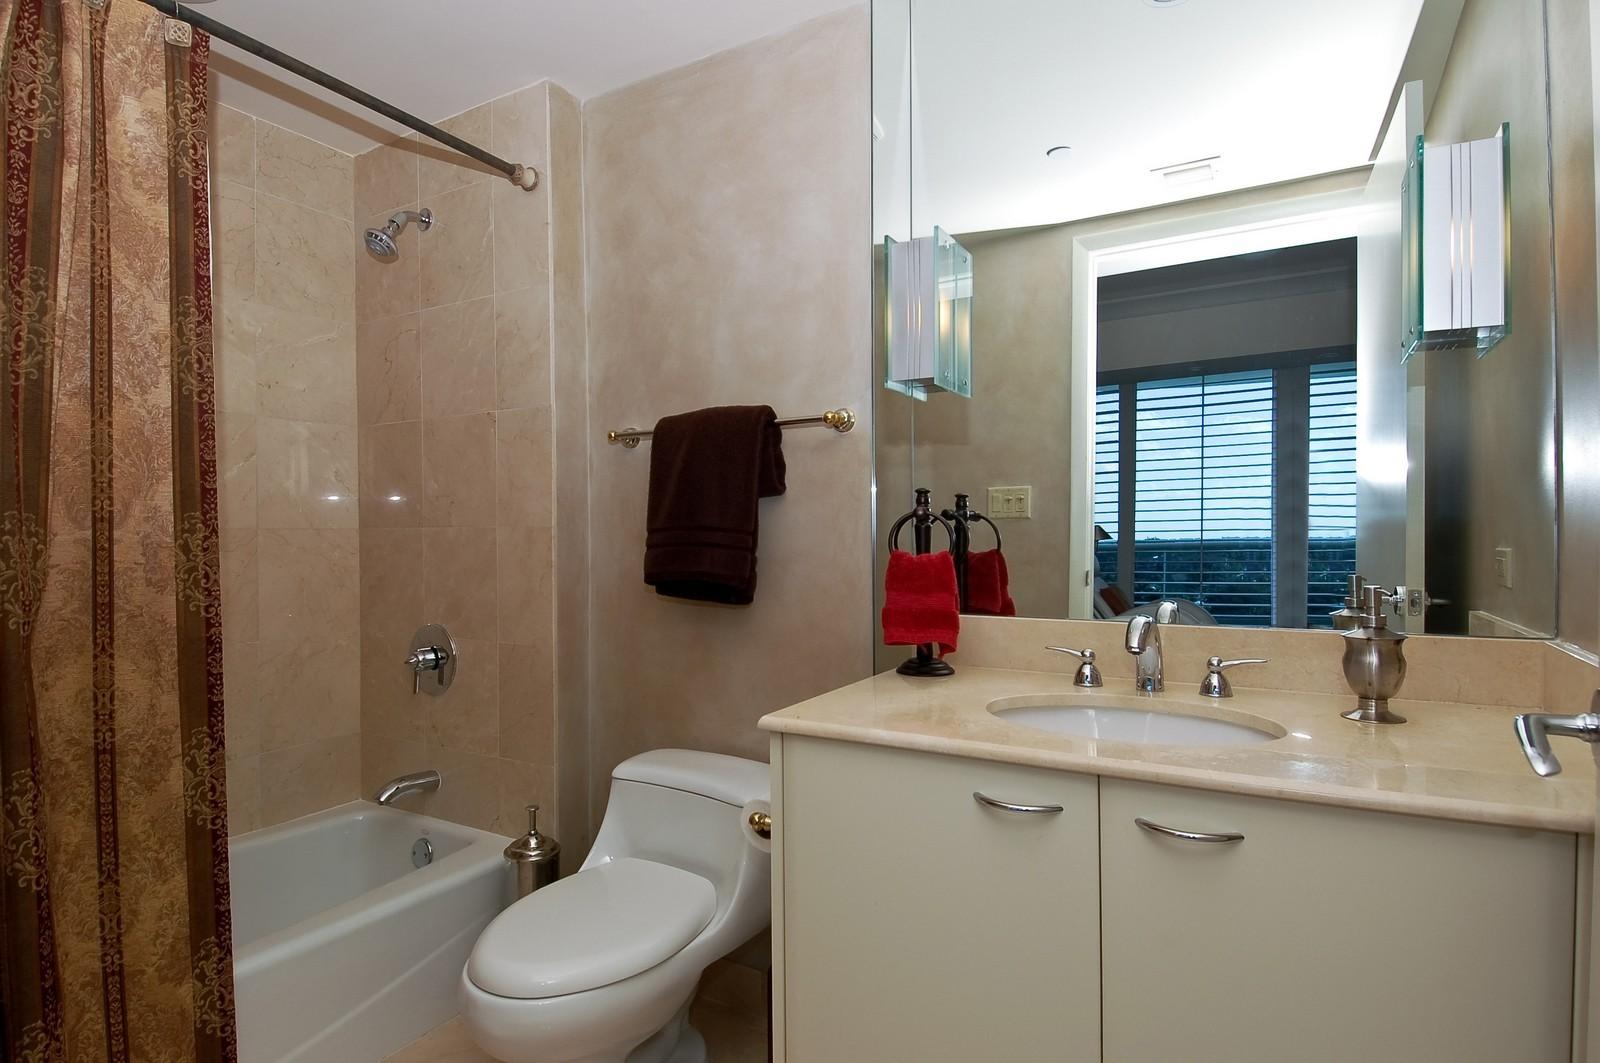 Real Estate Photography - 1600 S Ocean Blvd, Apt 802, Pompano Beach, FL, 33062 - 3rd Bathroom